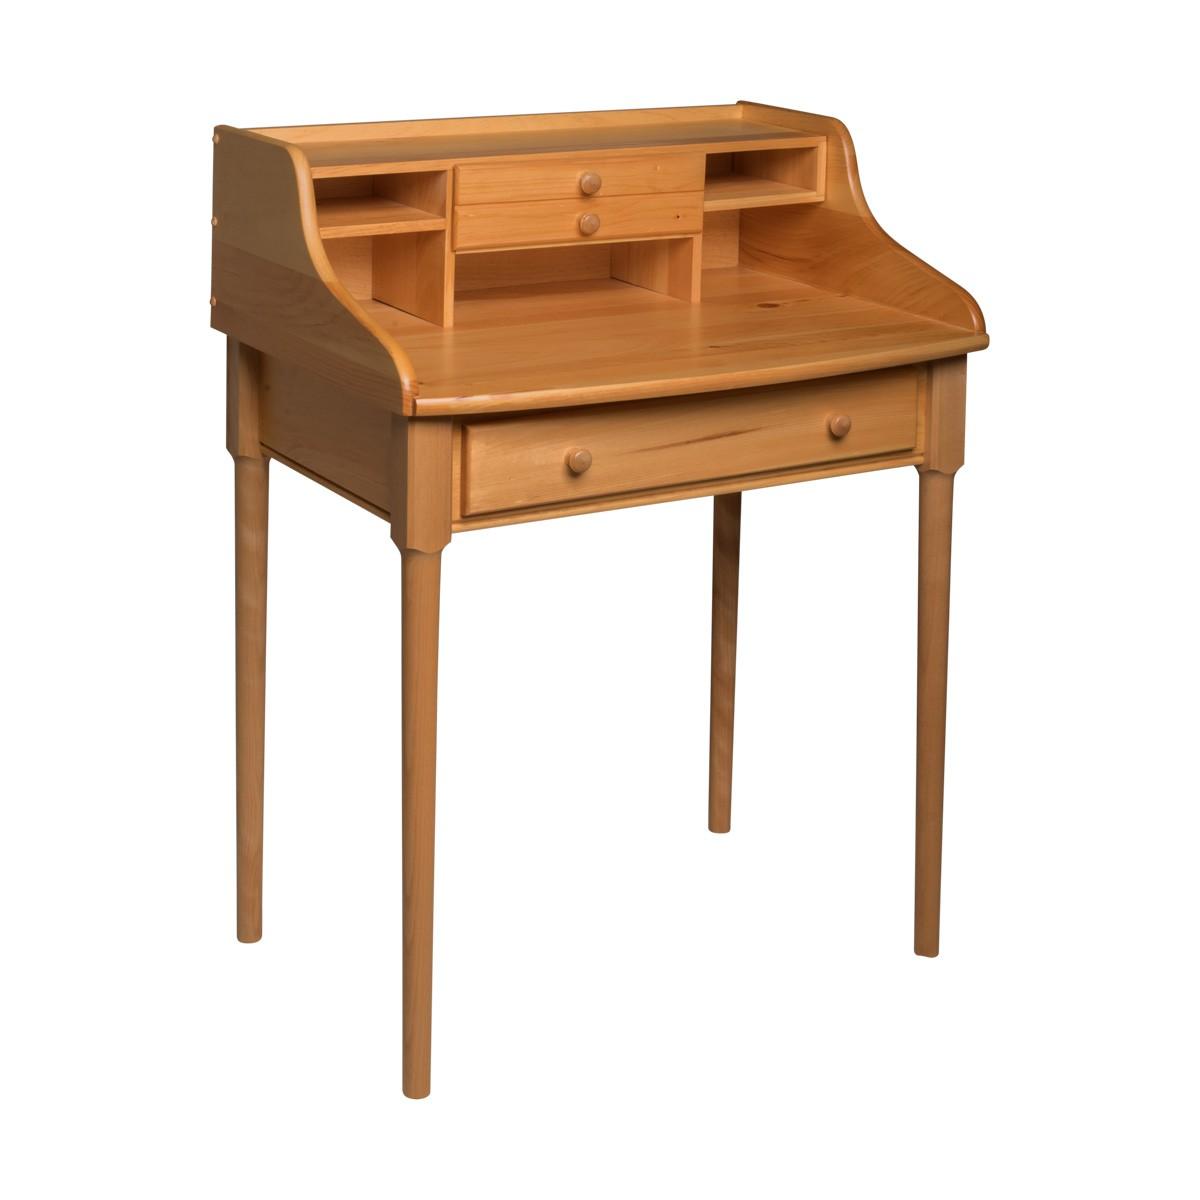 "Office Desk Country Solid Pine Bradford Desk 30""W"